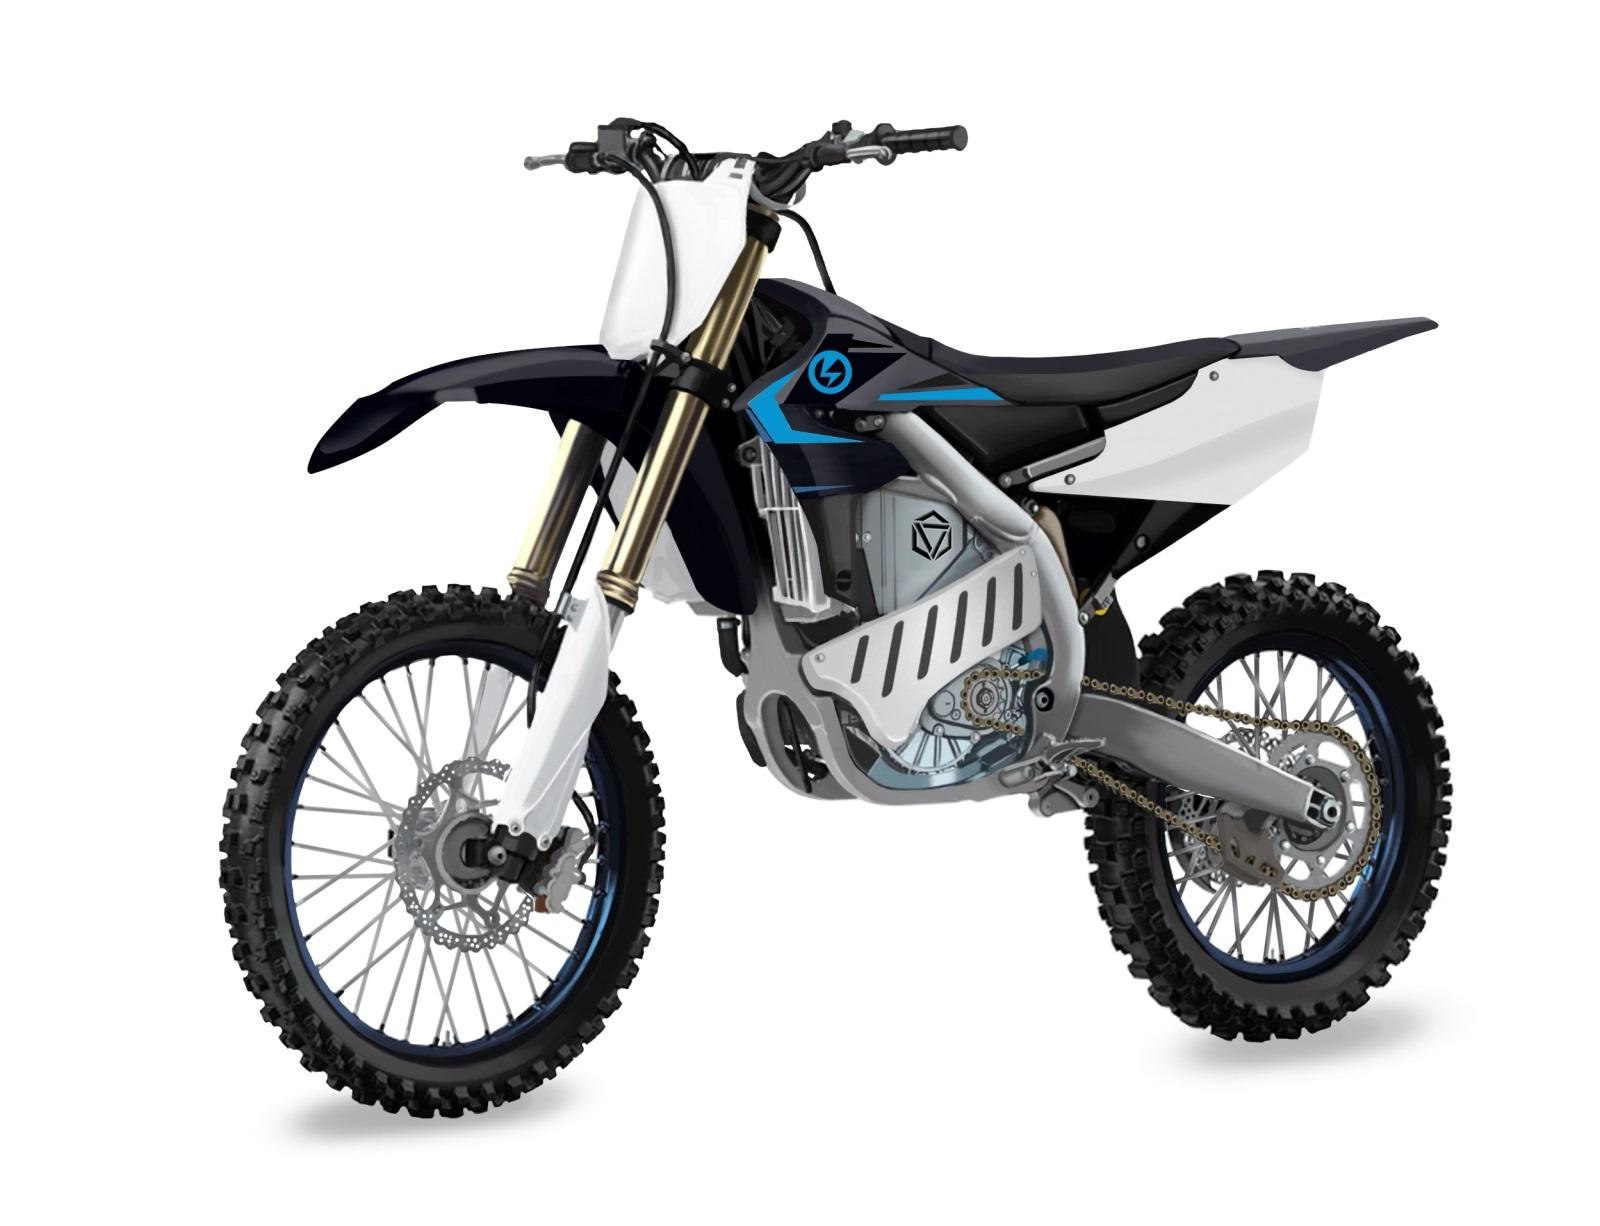 Yamaha Motor Europe, Dohms Projecten and ELEO Make Progress with Testing of the Electric MX